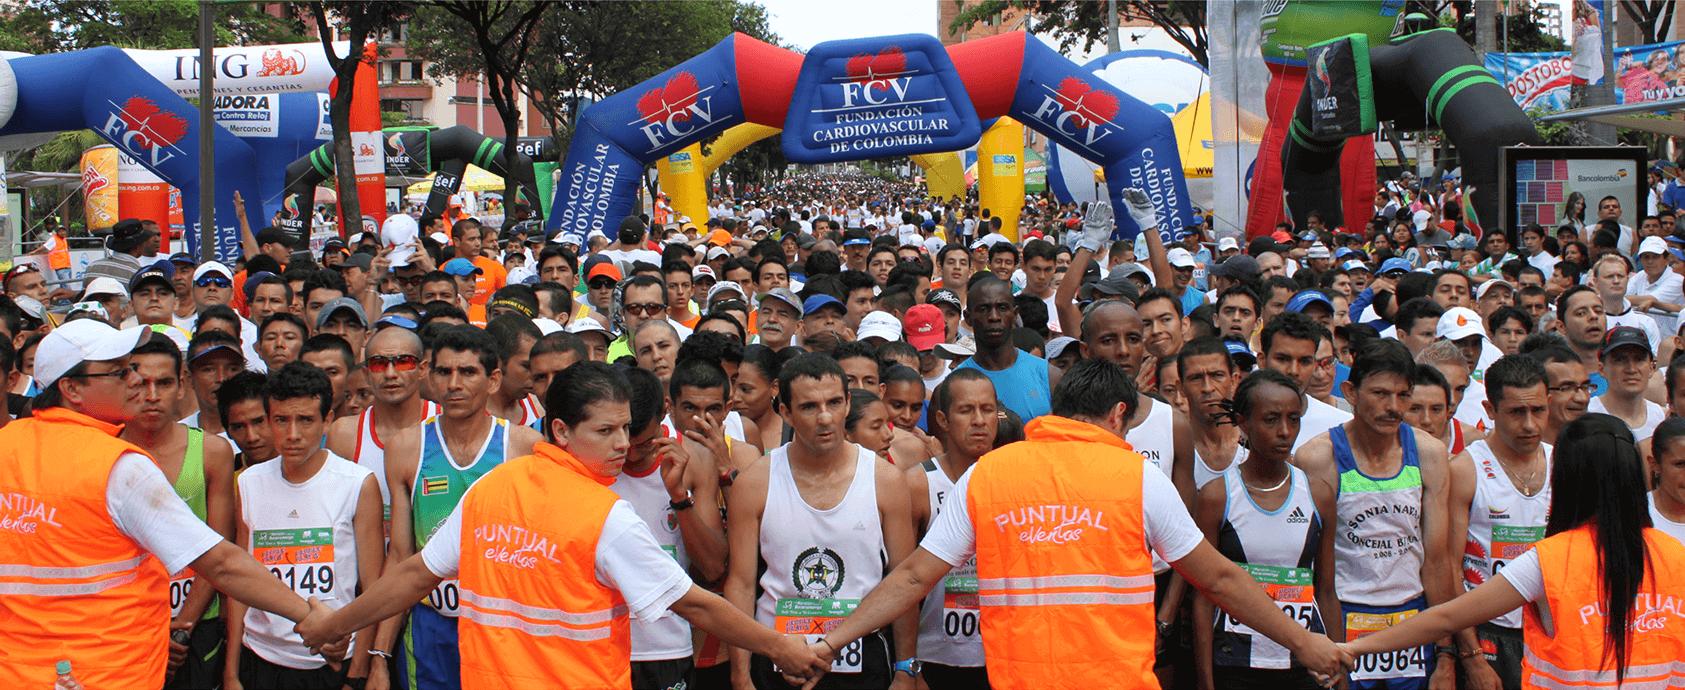 Segunda Media Maratón de Bucaramanga FCV  | Deportes | EL FRENTE